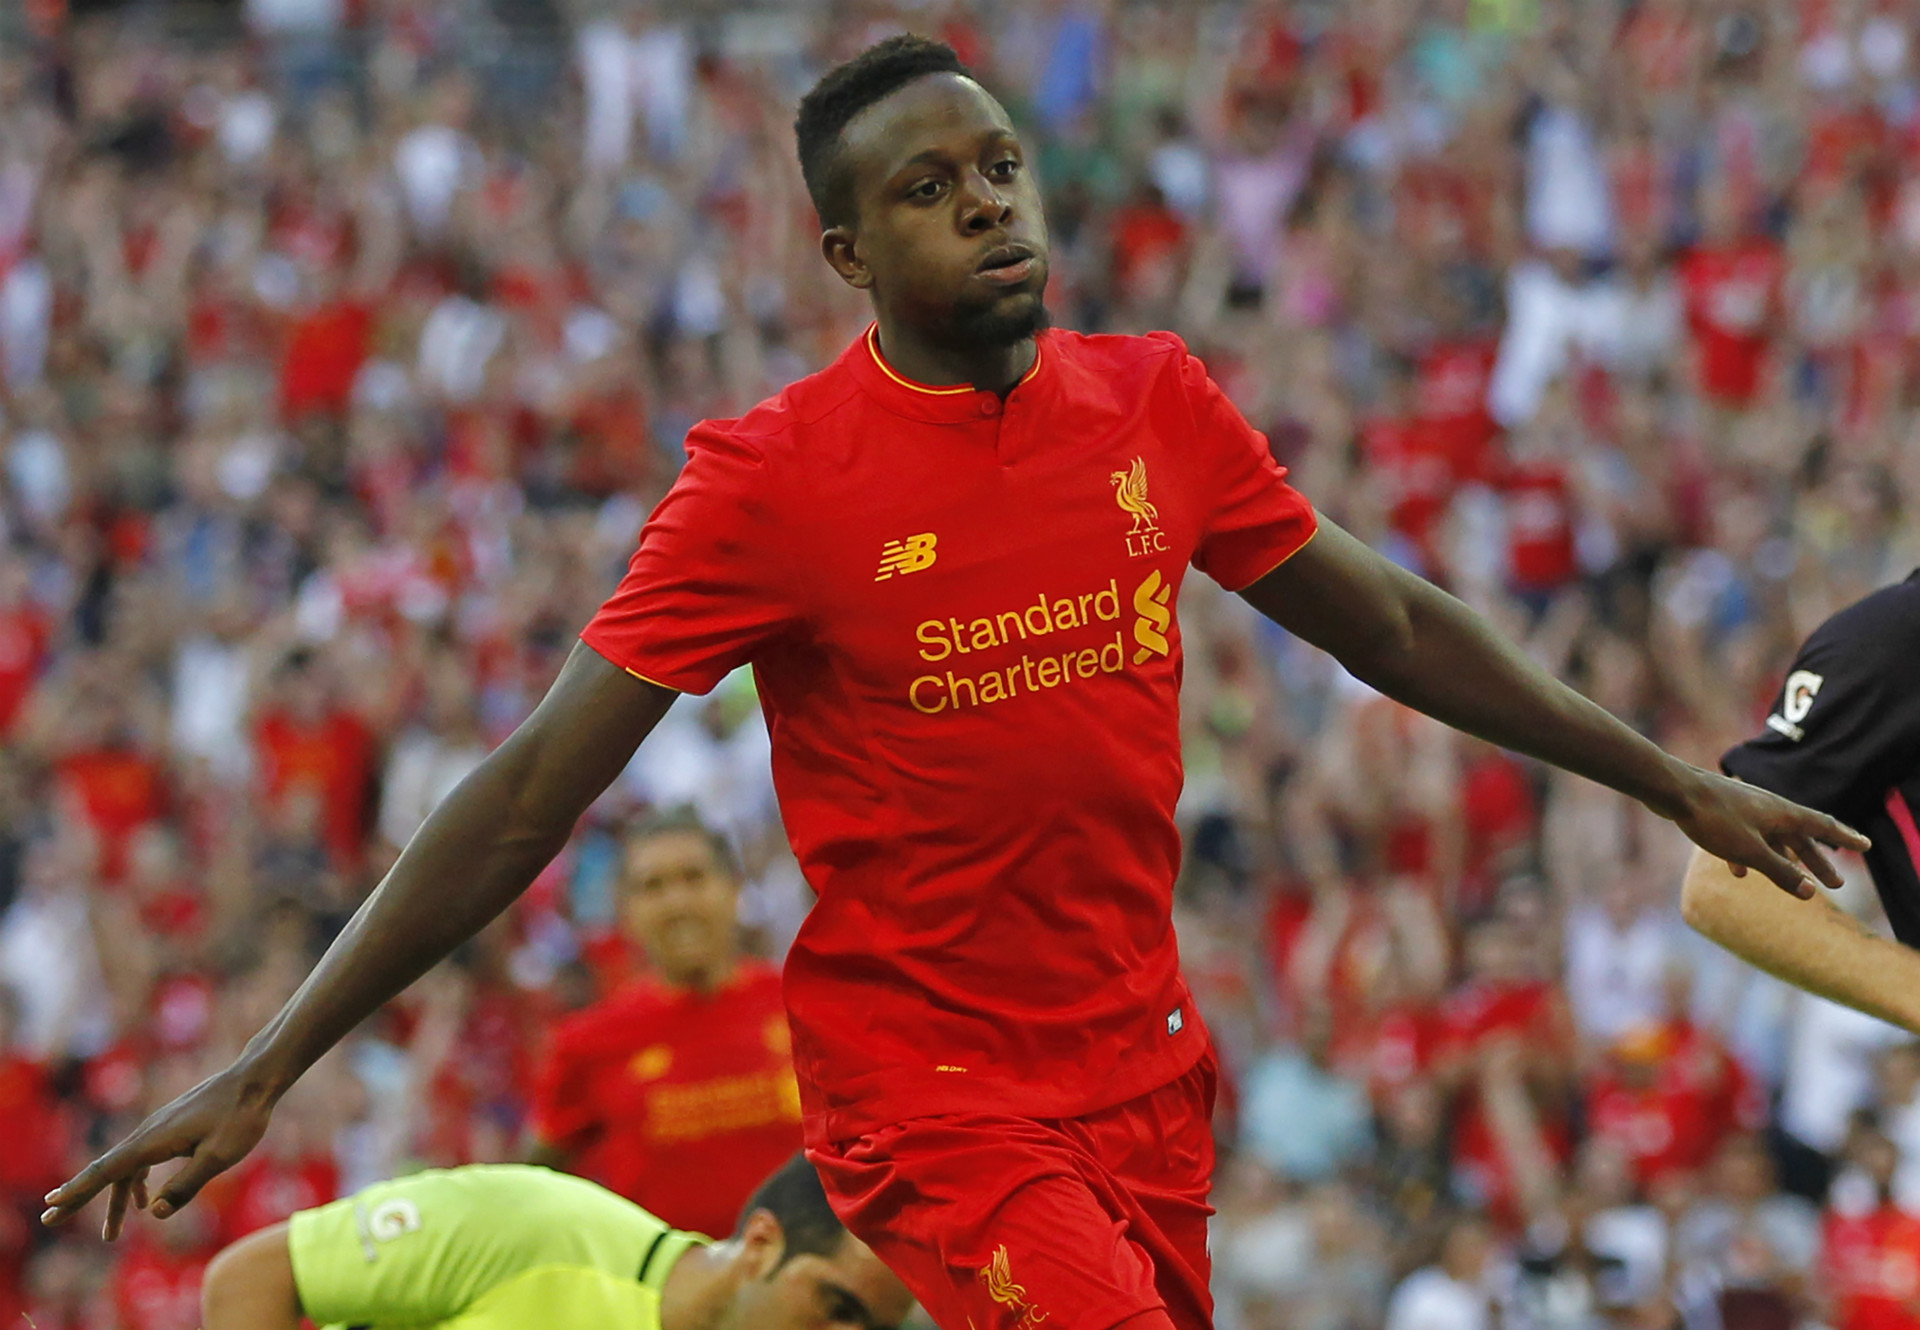 Liverpool demolish Barcelona as Sadio Mane sparkles